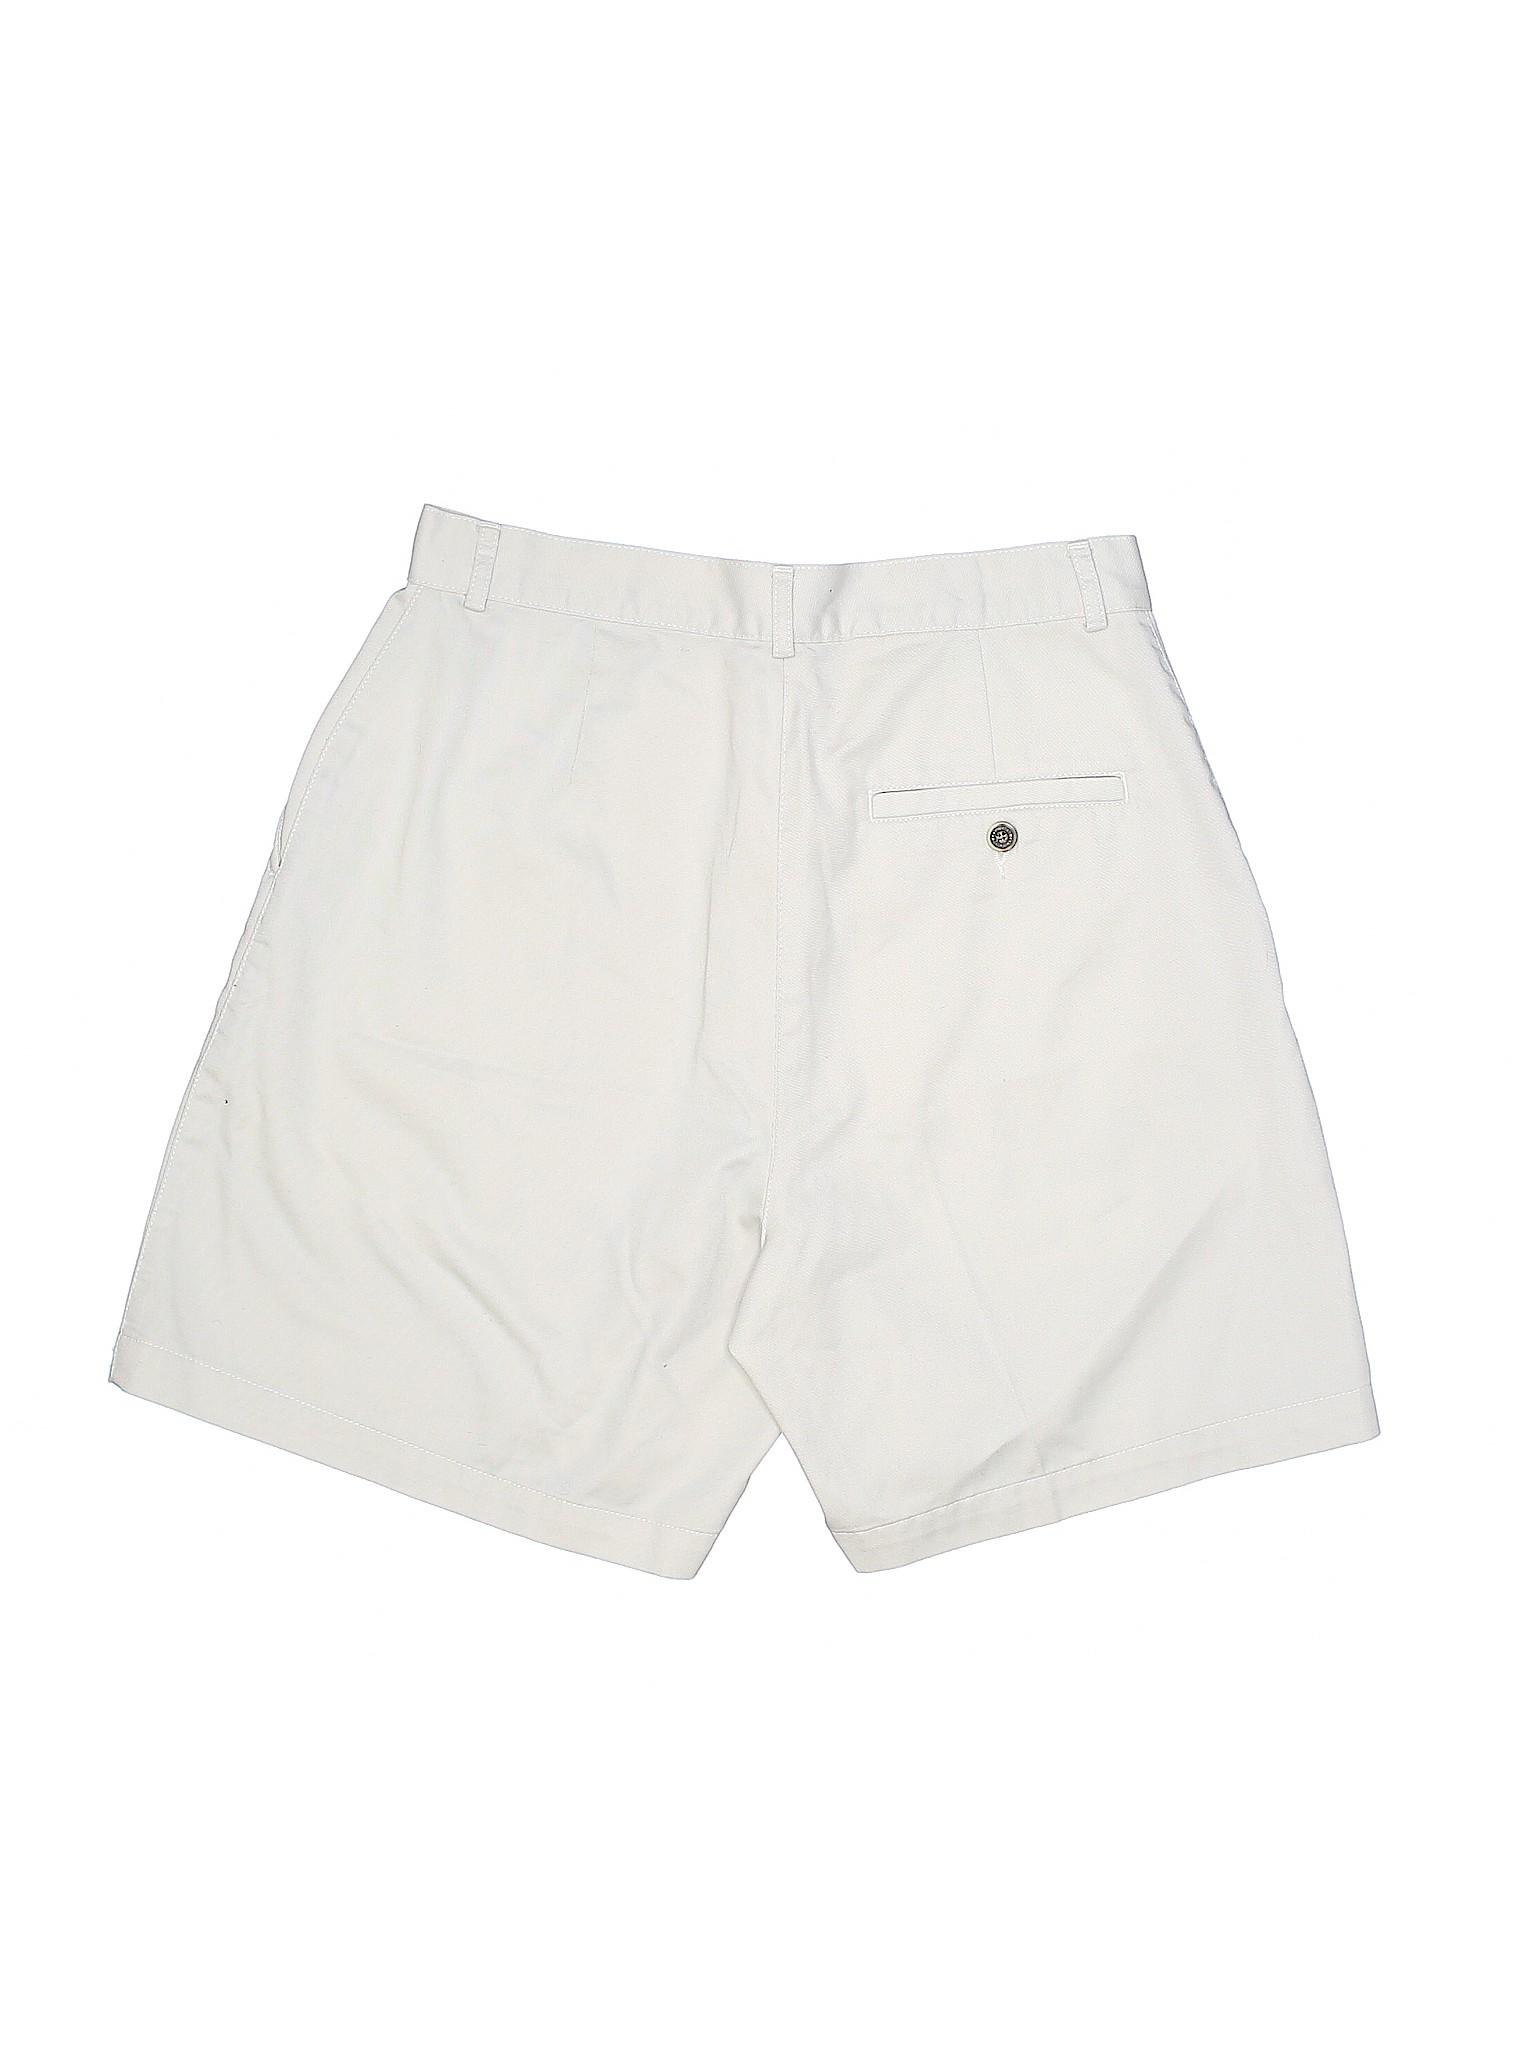 Bean Khaki Shorts L Boutique L q1BEqP